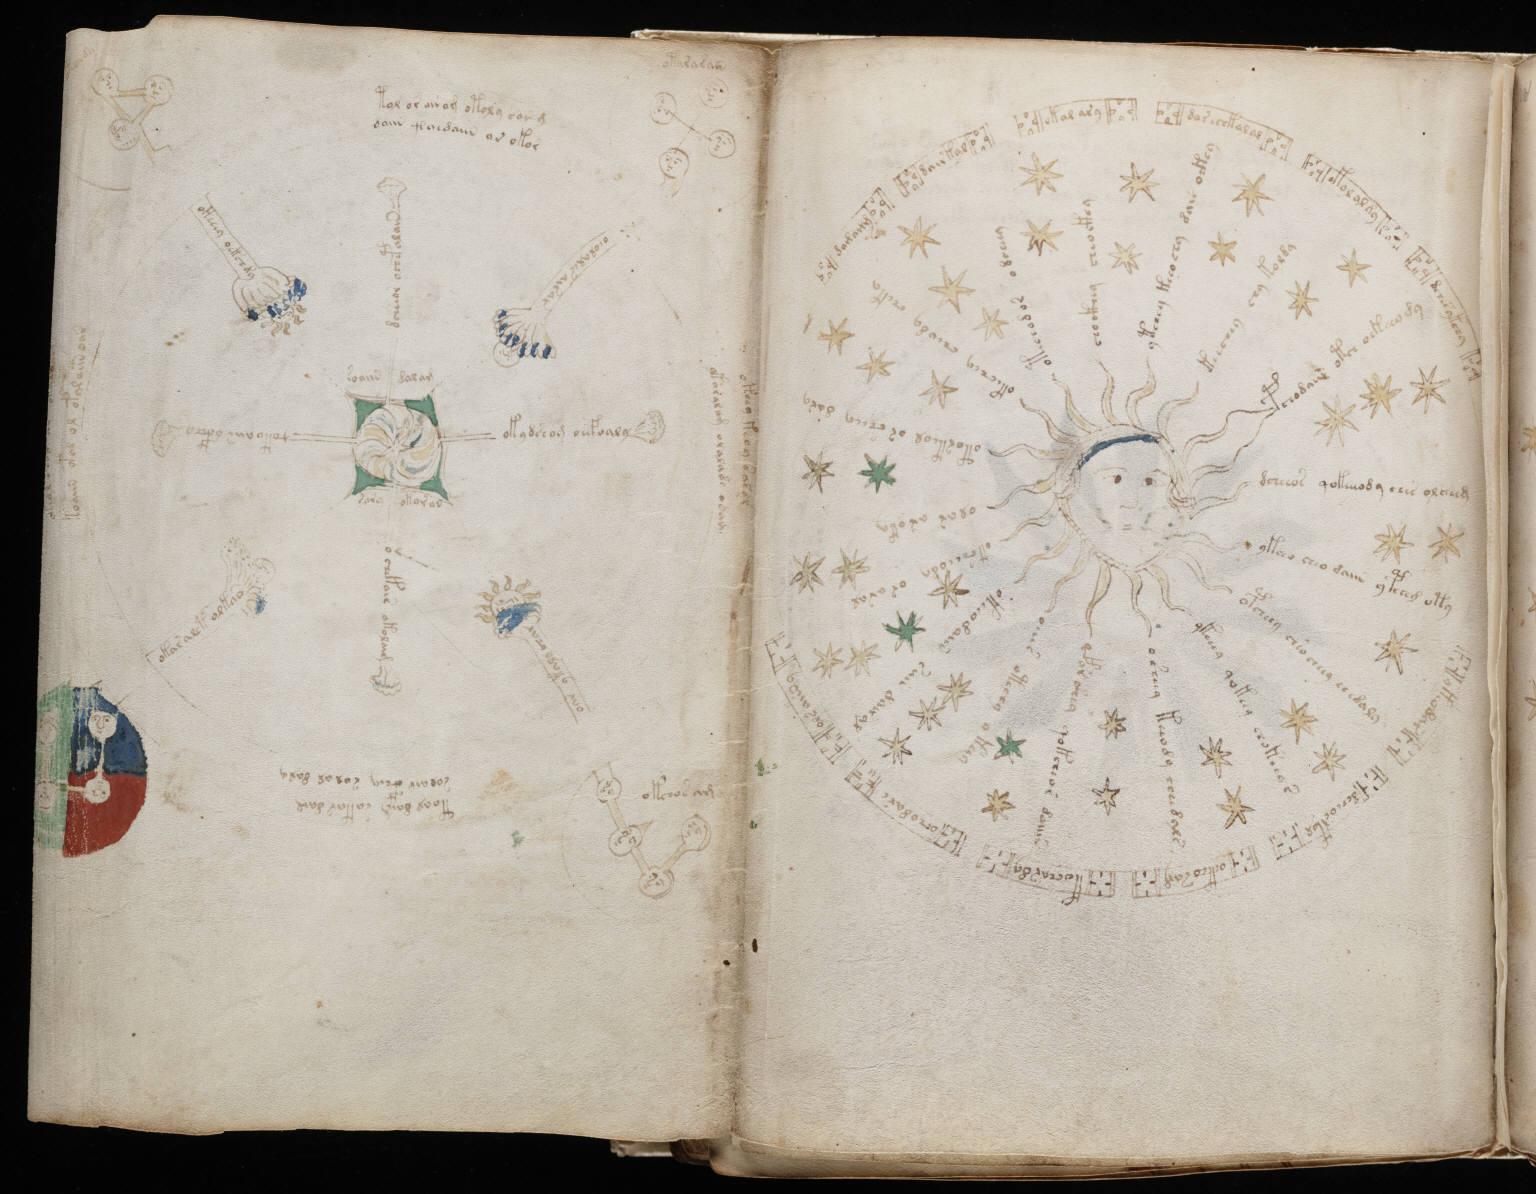 Voynich Manuscript %28122%29 ヴォイニッチ手稿(写本) どの言語にも属さない謎の文字!